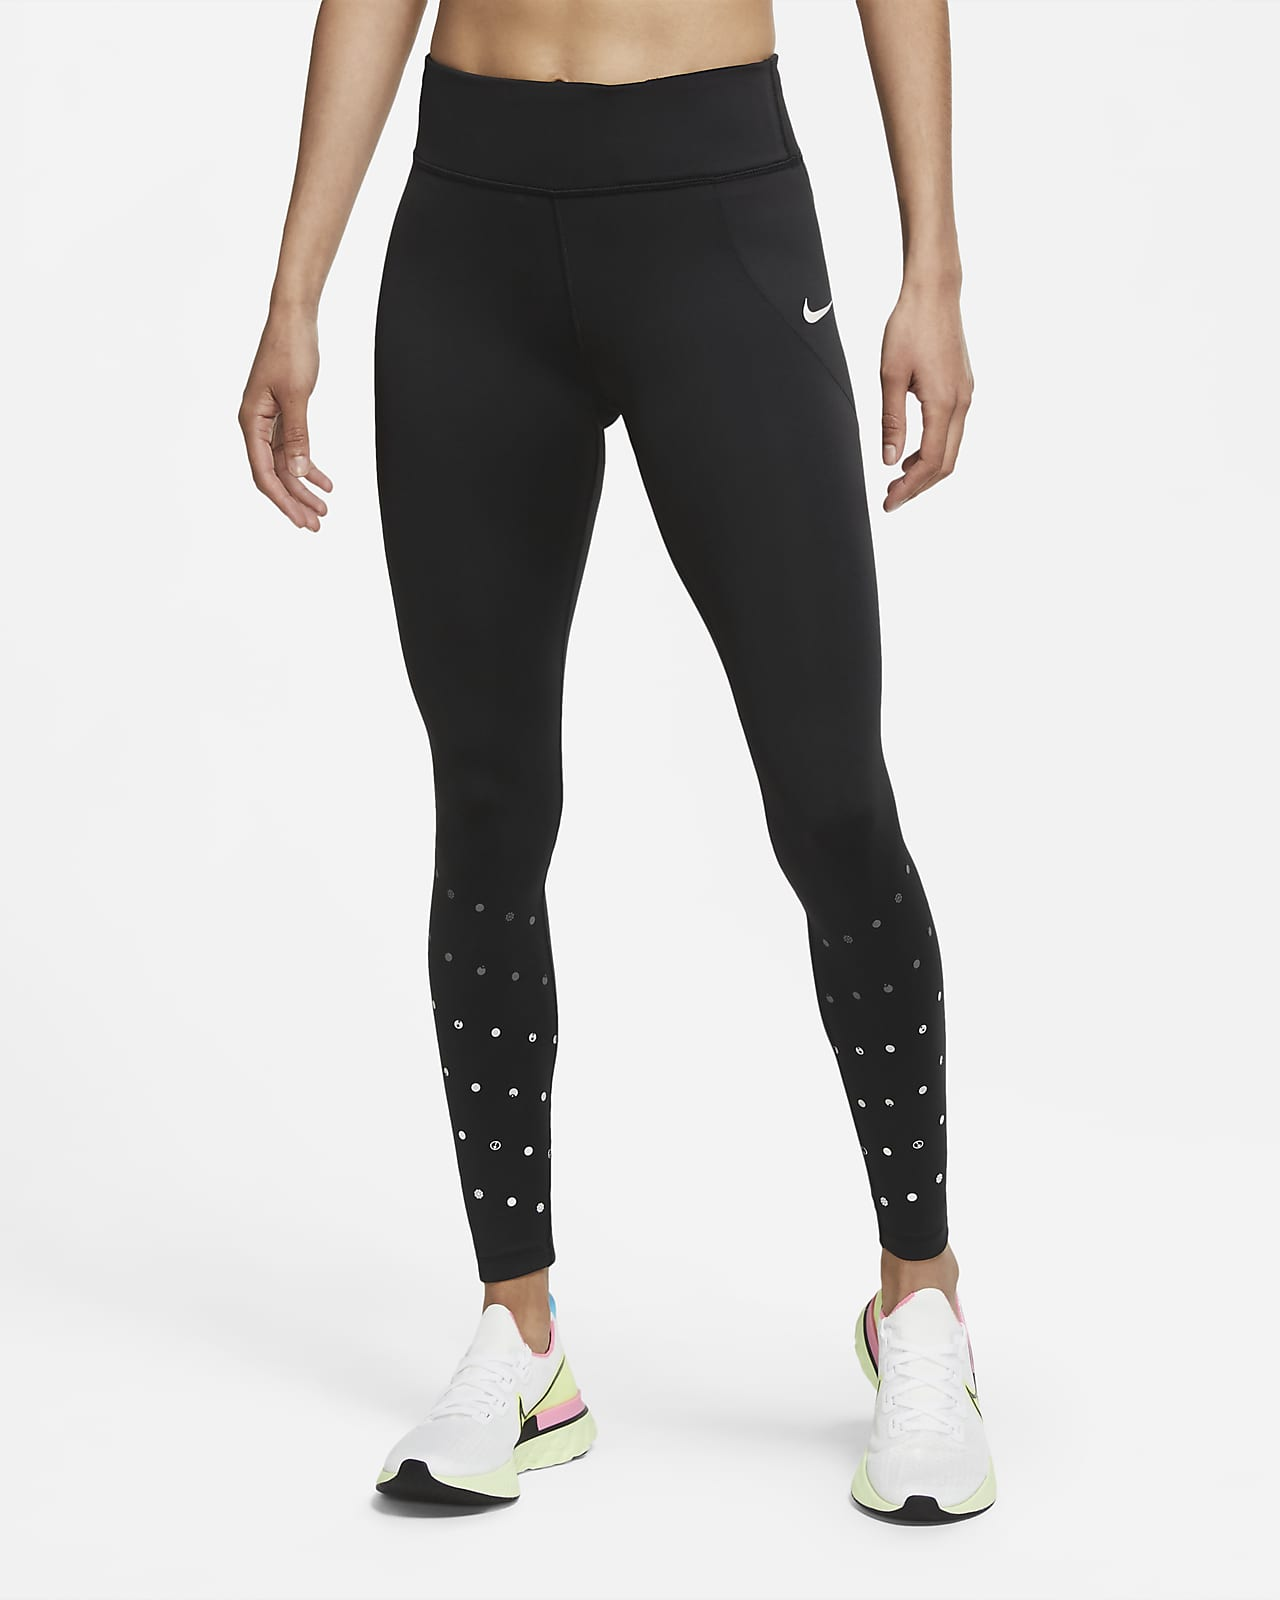 Nike Fast Flash Women's Running Leggings